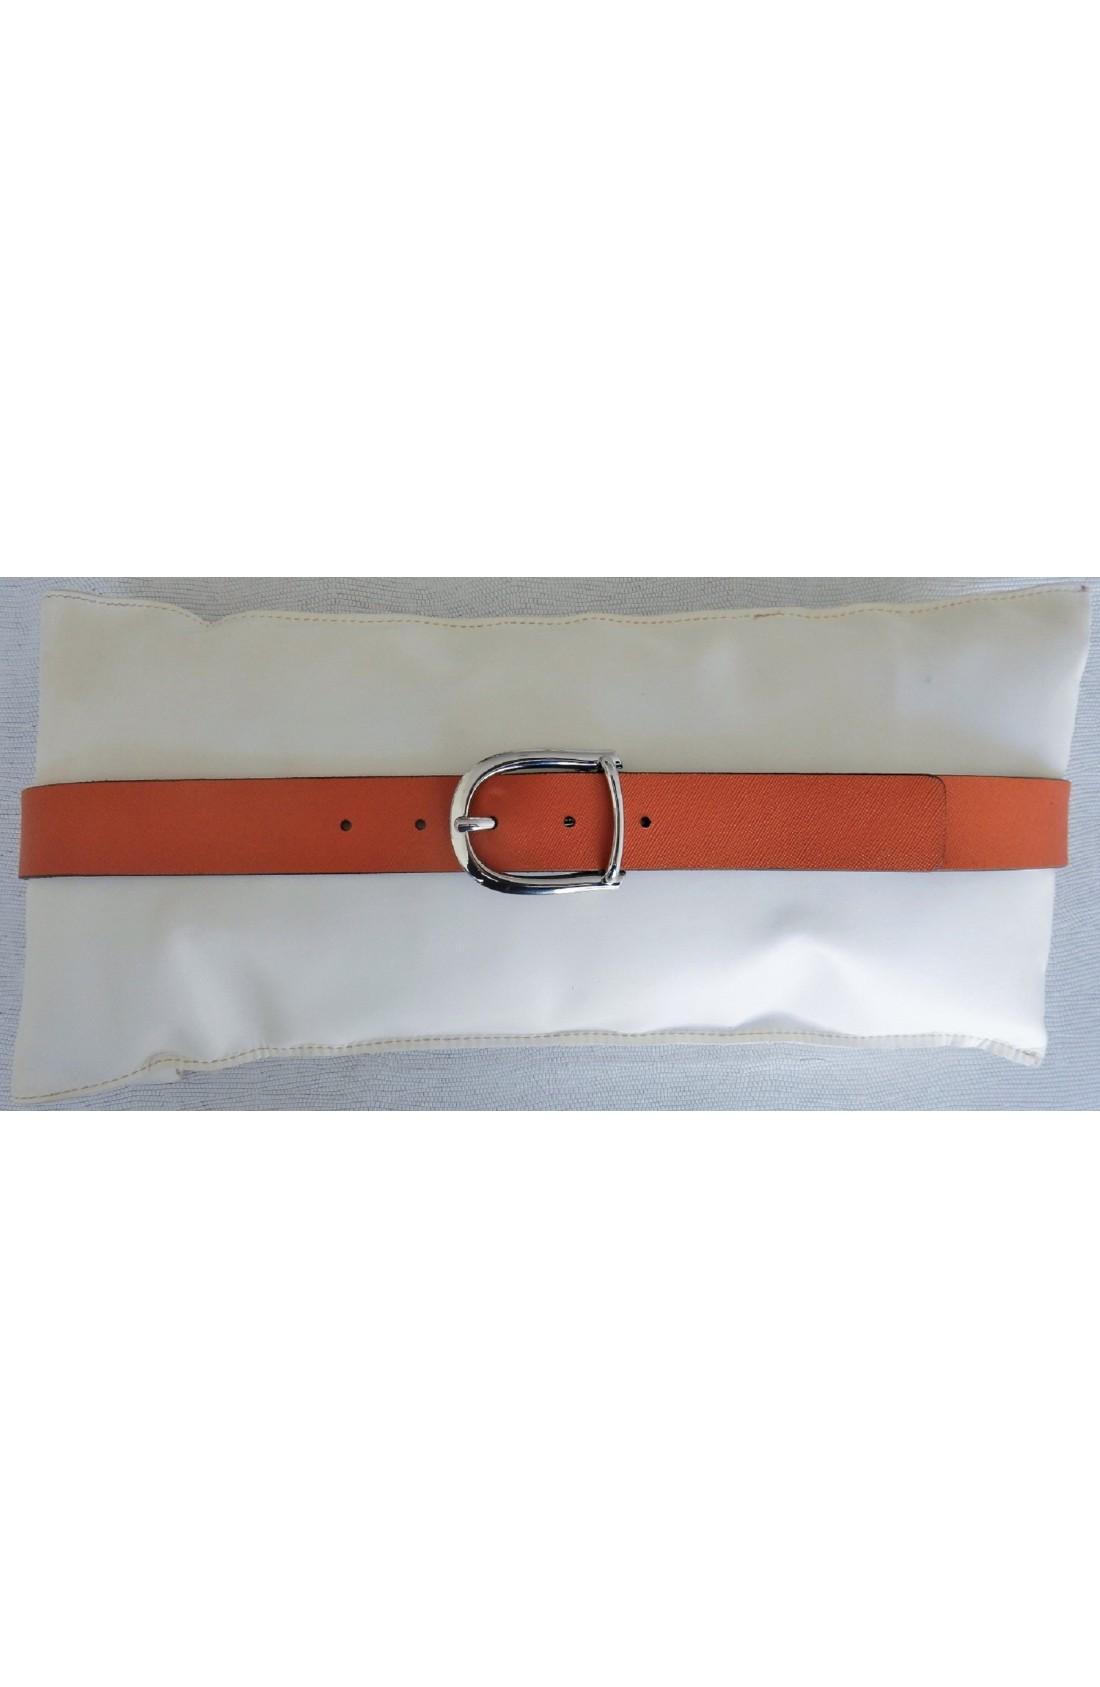 CINTURA DONNA art. 473 SAFFIANO mm.35 var. 8 arancione Fibbia Standard L 66 mm.35 nikel free (3)